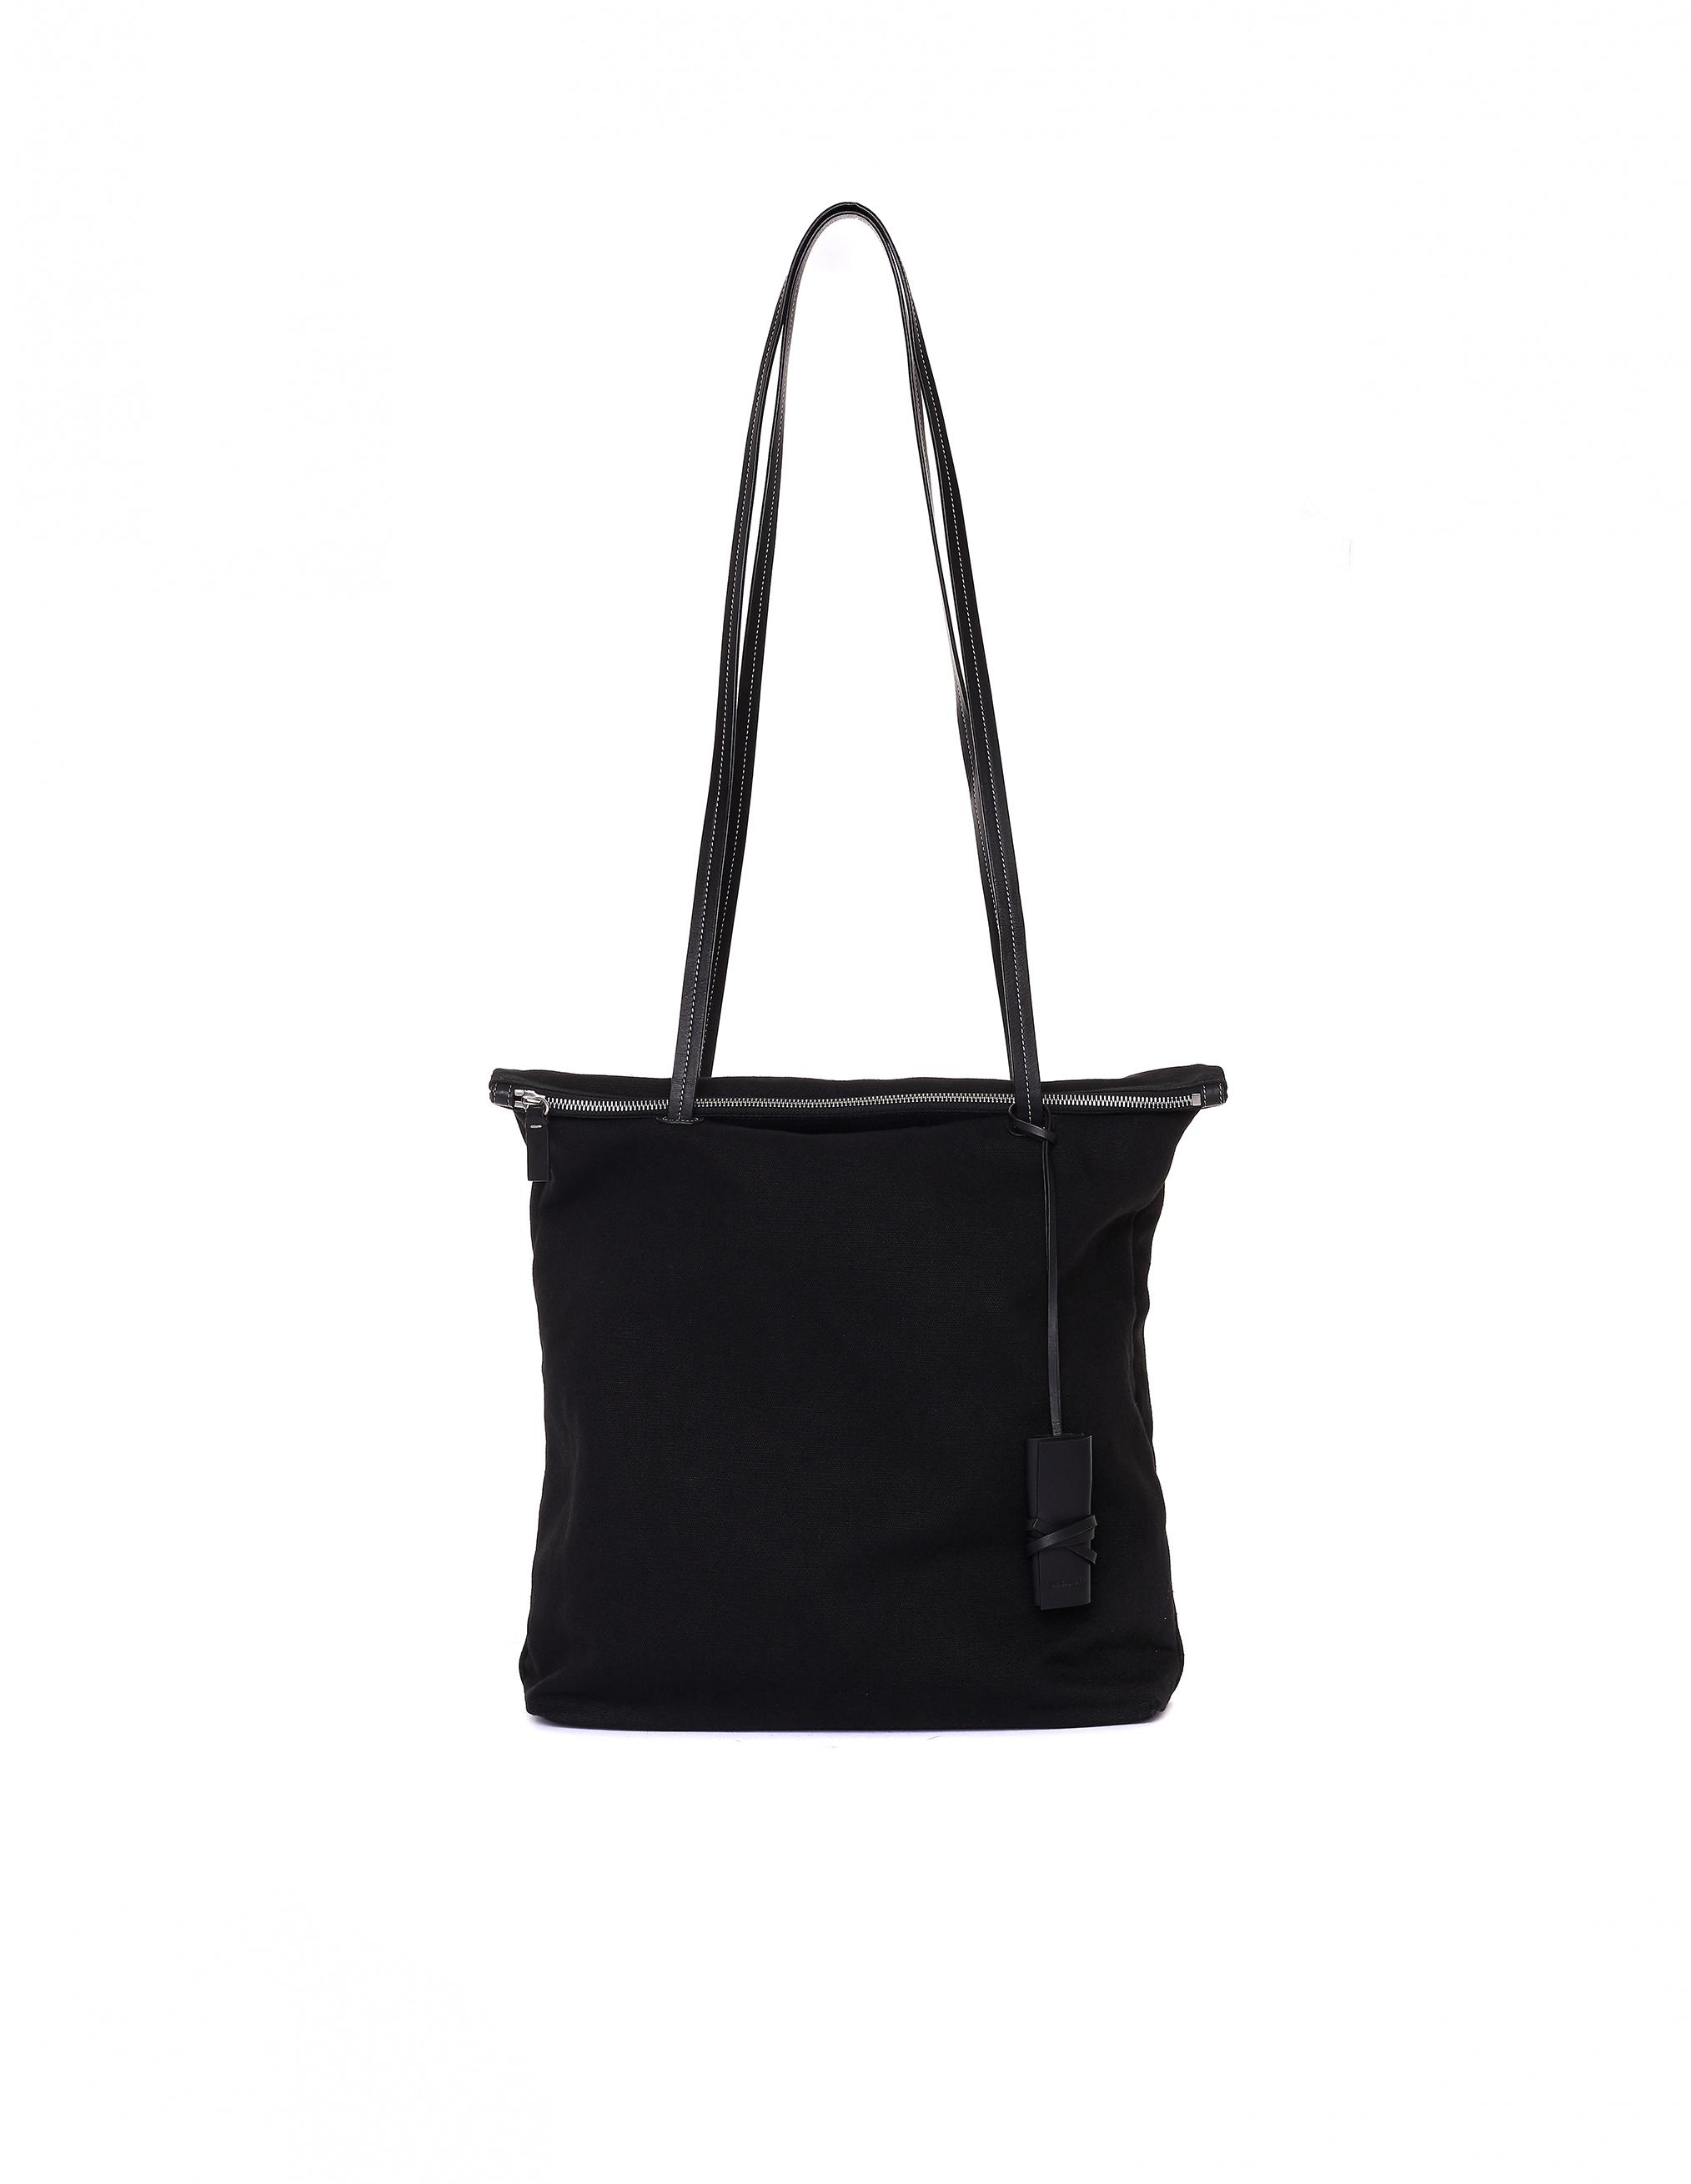 Jil Sander Black Cotton & Linen Shopper Bag